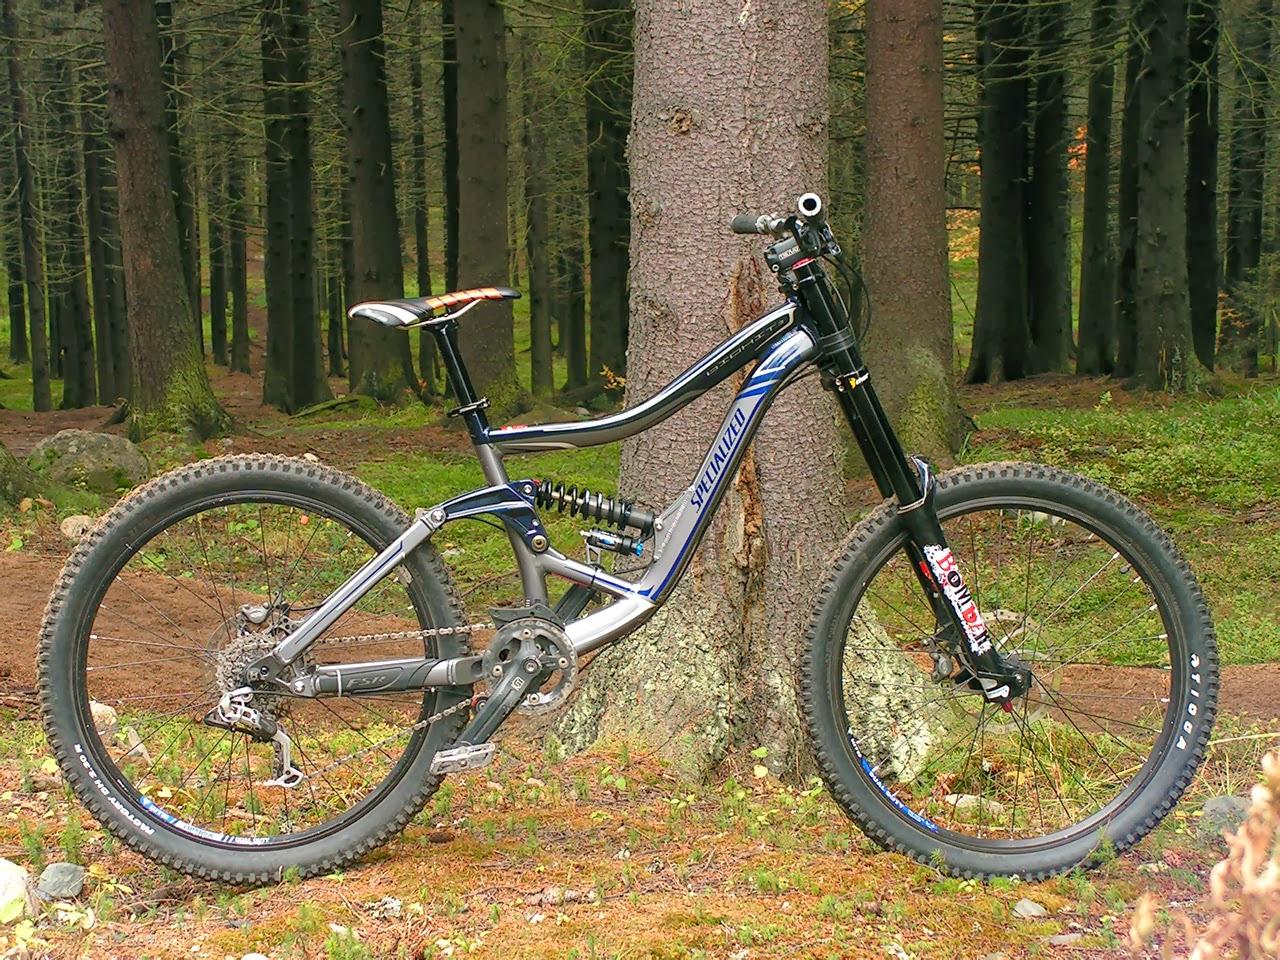 Van S Mountain Bike My Bikes From 2007 Till 2013 Part 3